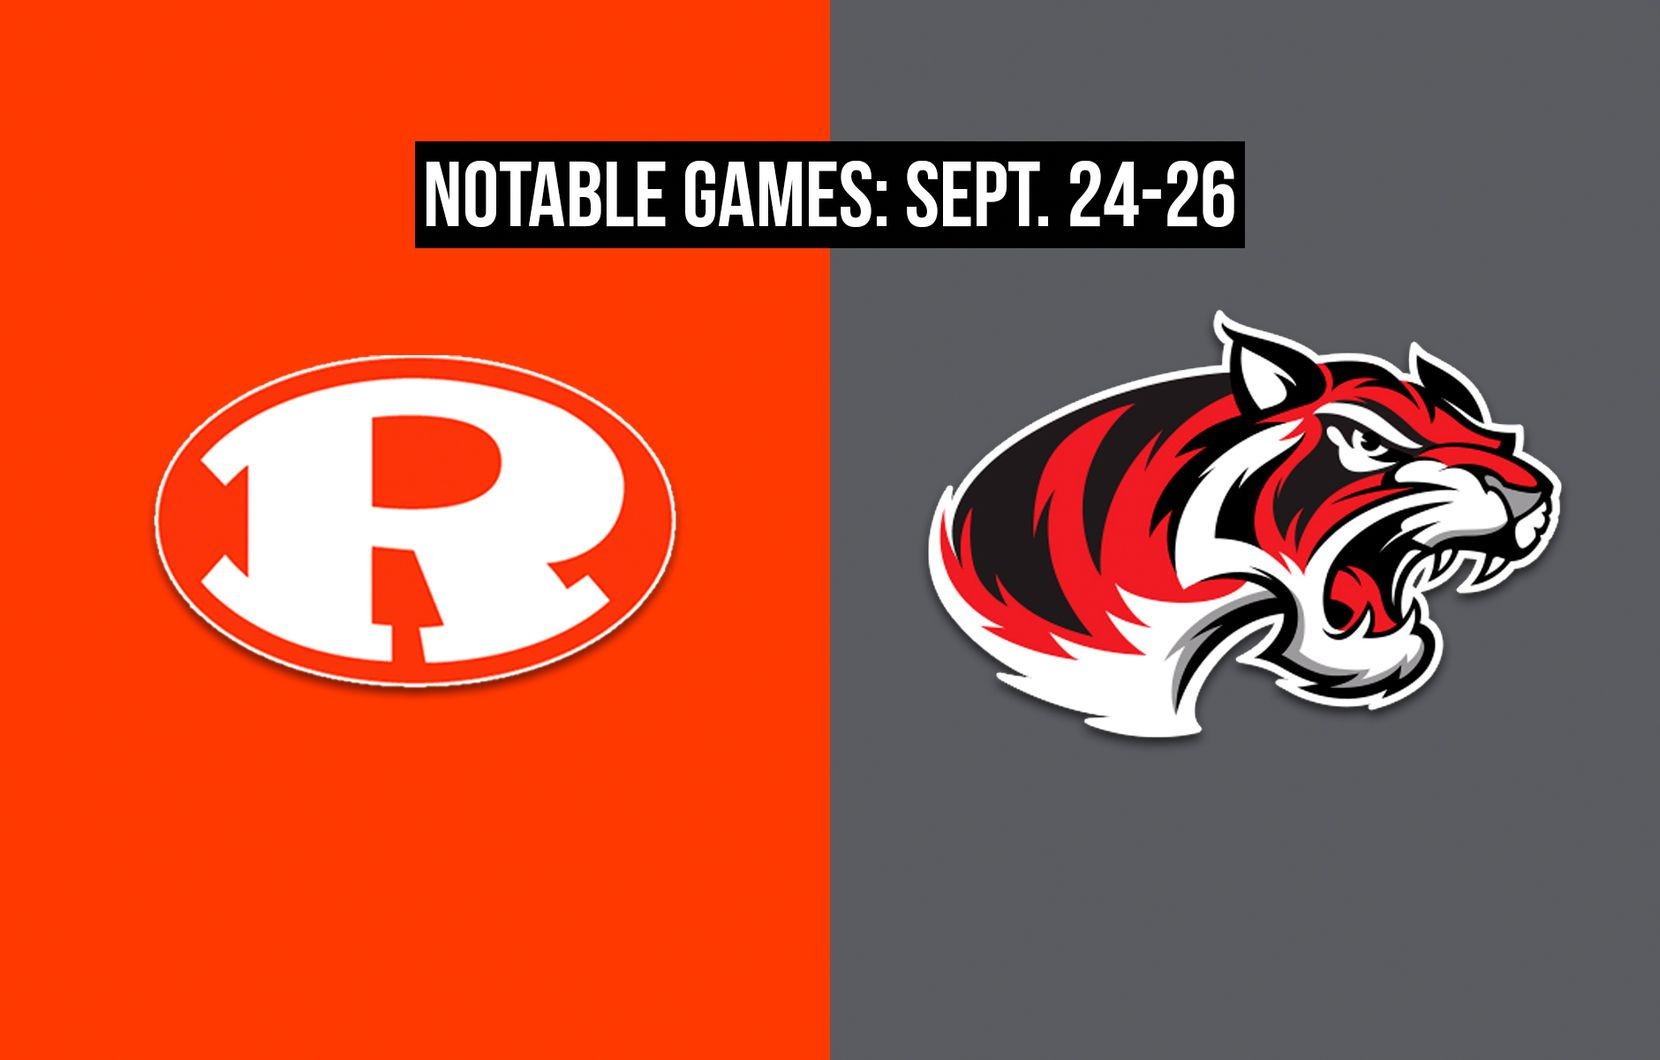 Notable games for the week of Sept. 24-26 of the 2020 season: Rockwall vs. Denton Braswell.